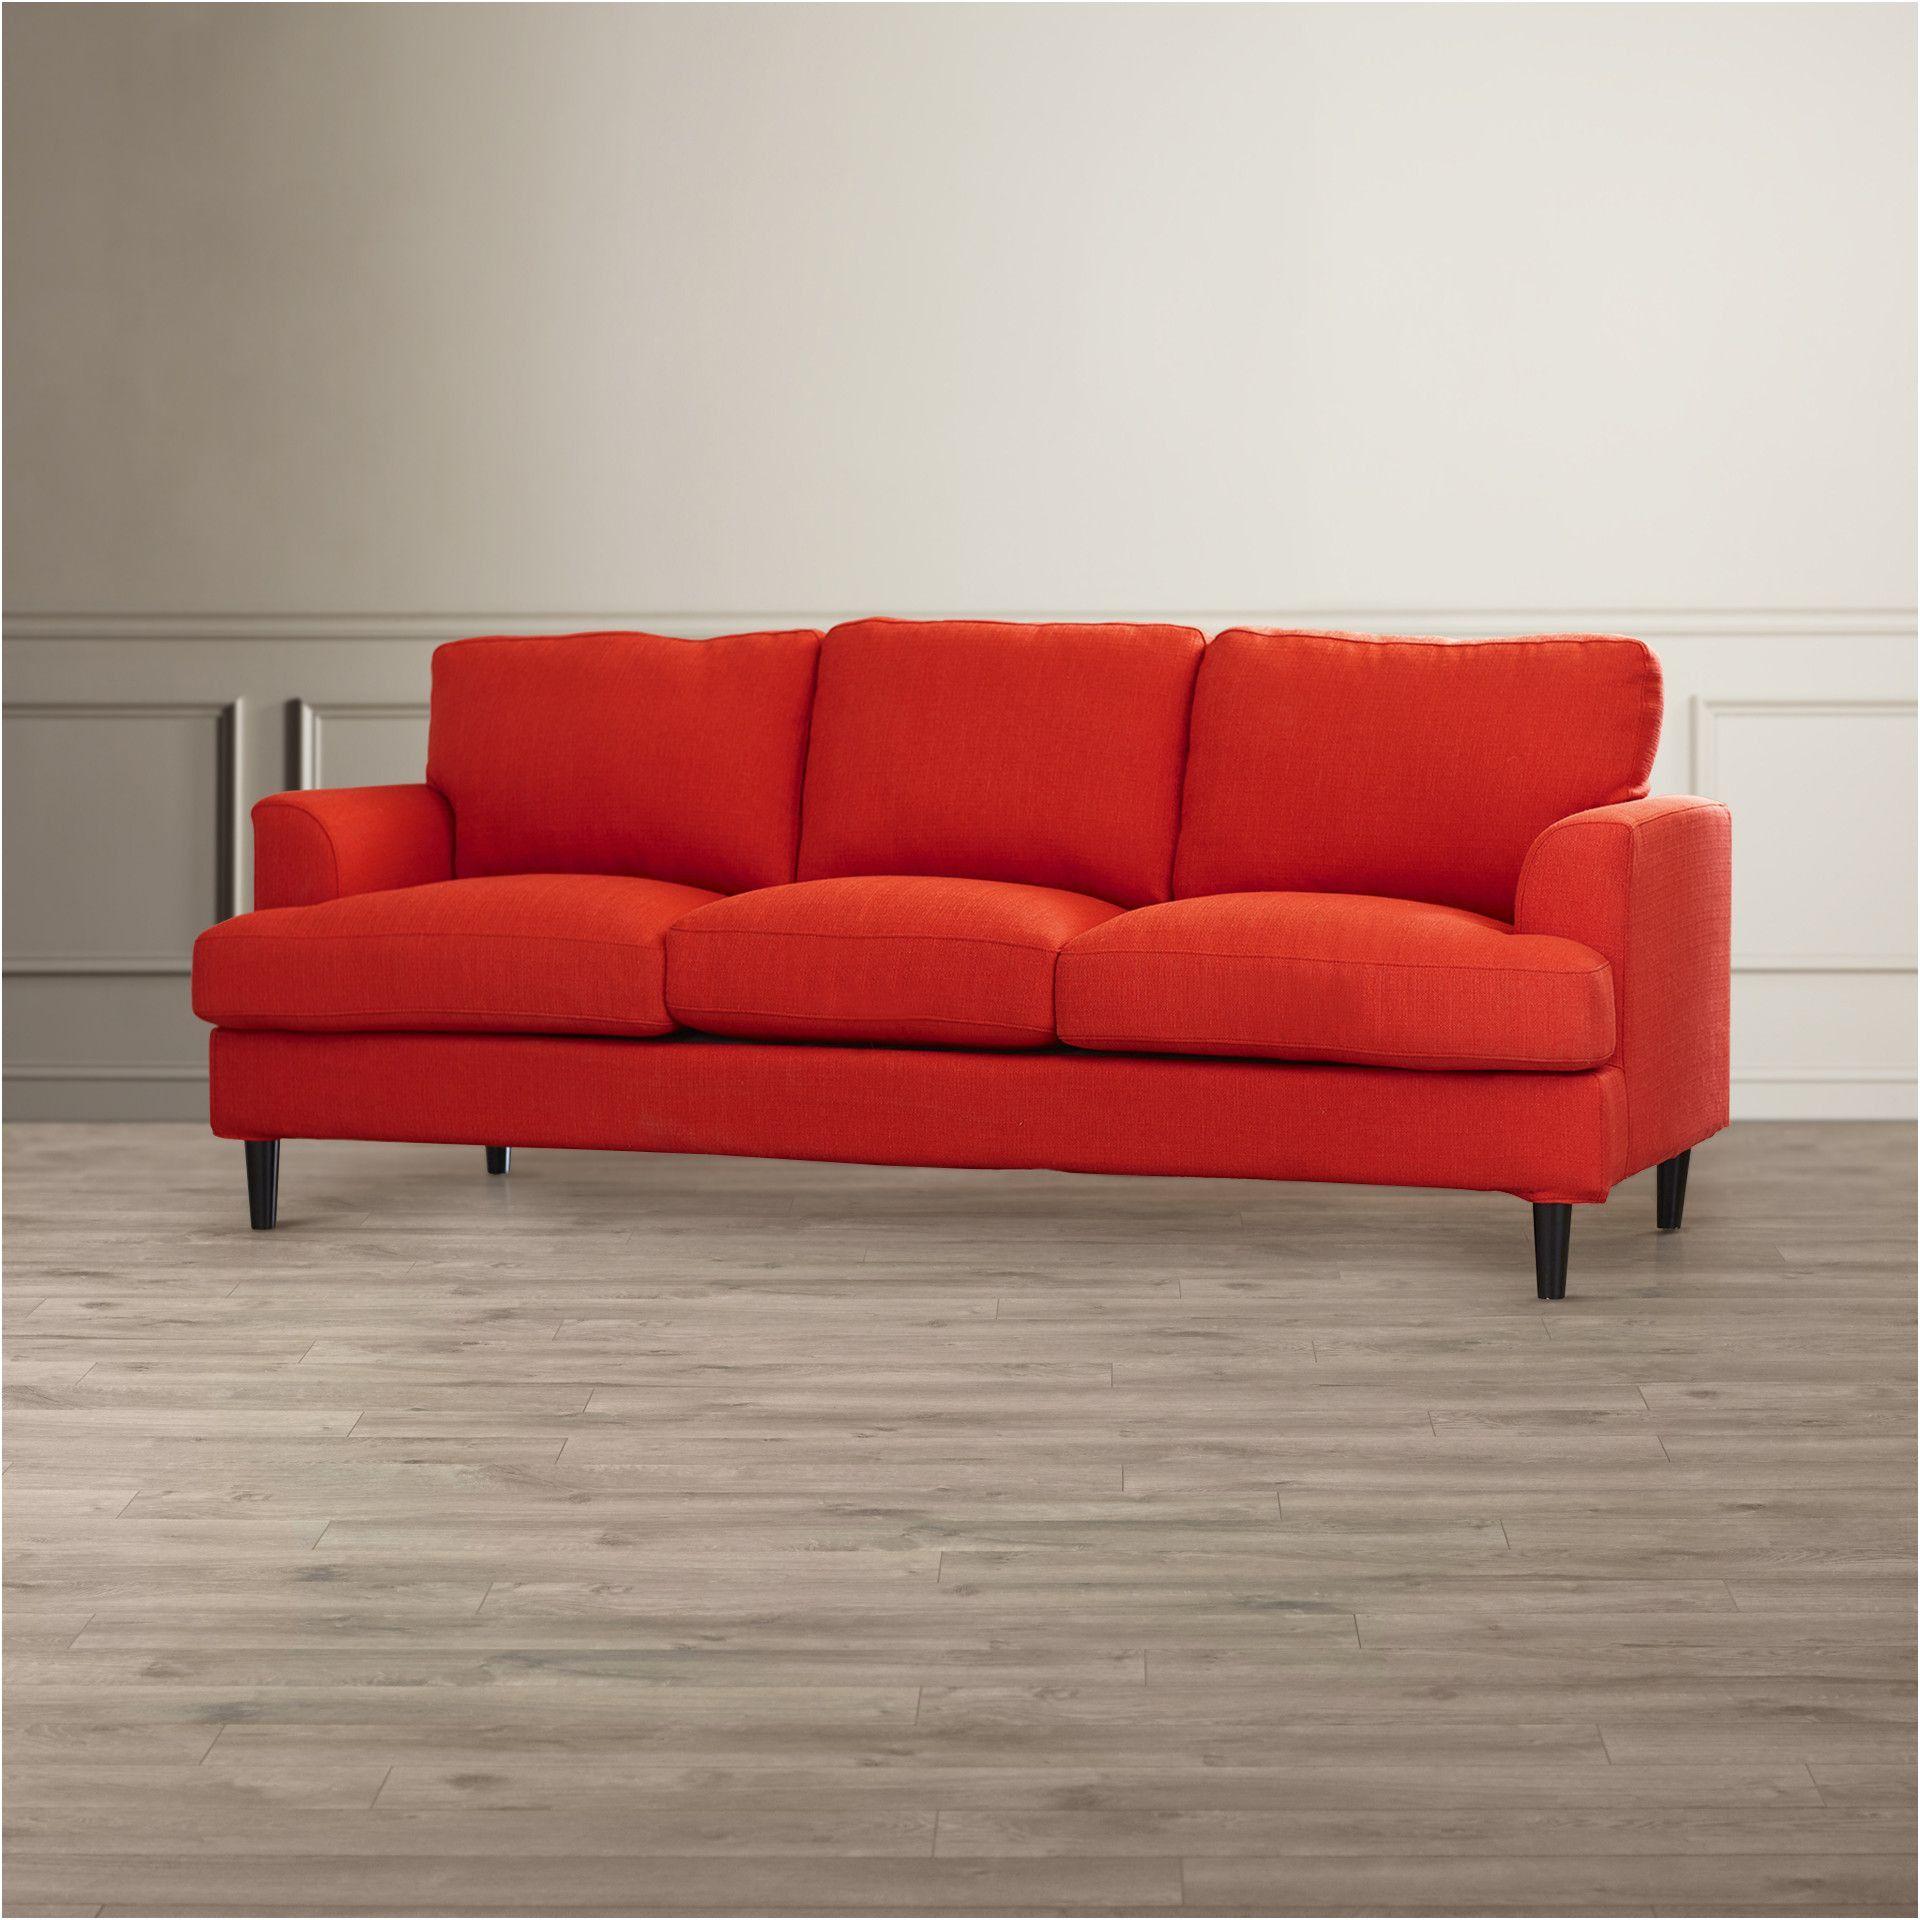 Kunstlerisch Rundecke Couch Couch Mobel Slipcovers Sofa